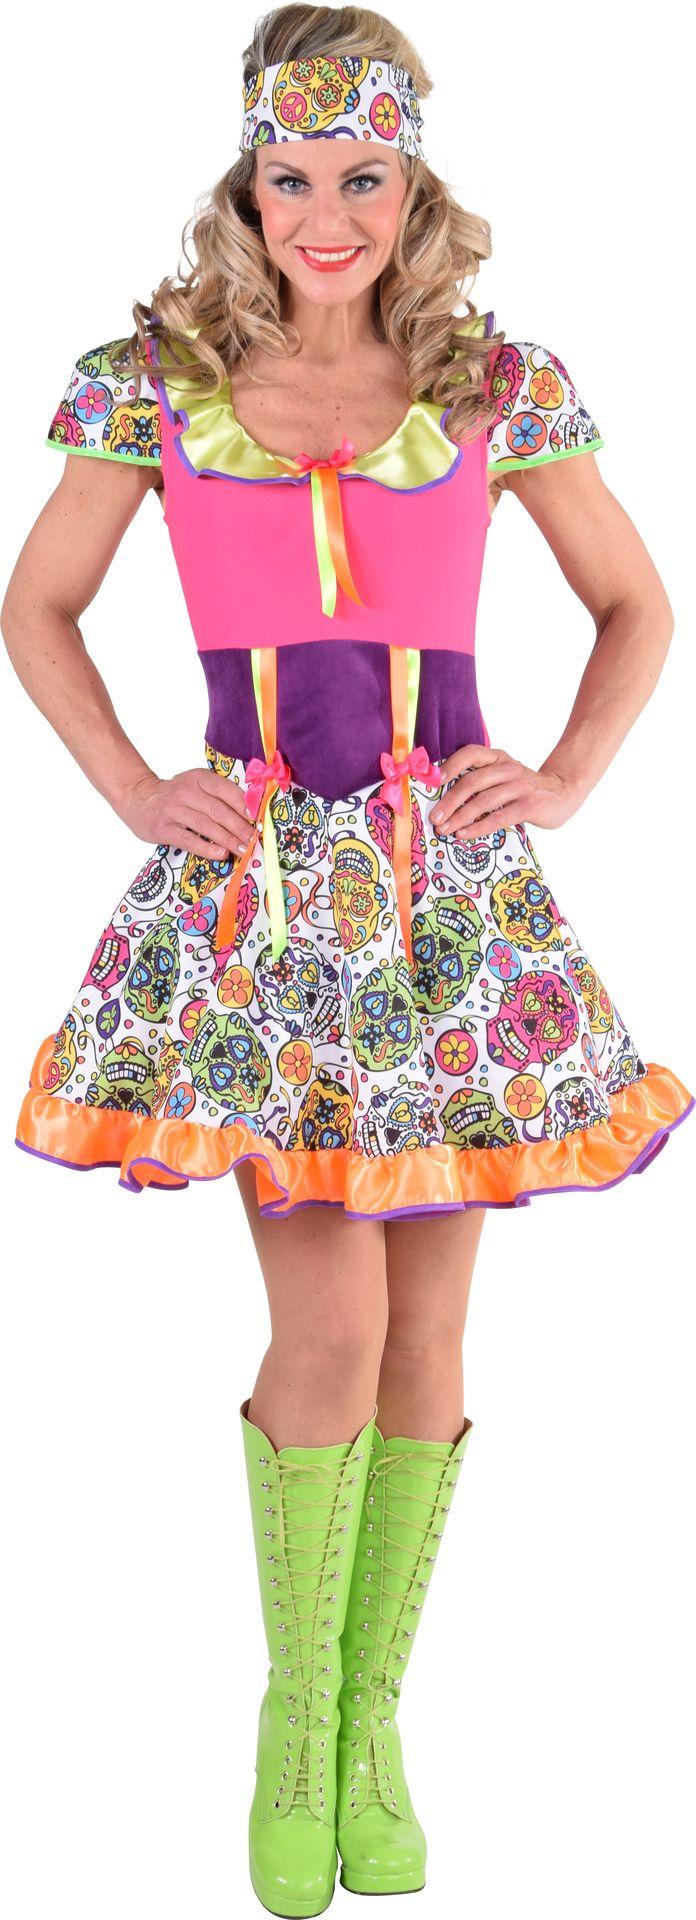 Kleurige Dia de los Muertos jurk dames